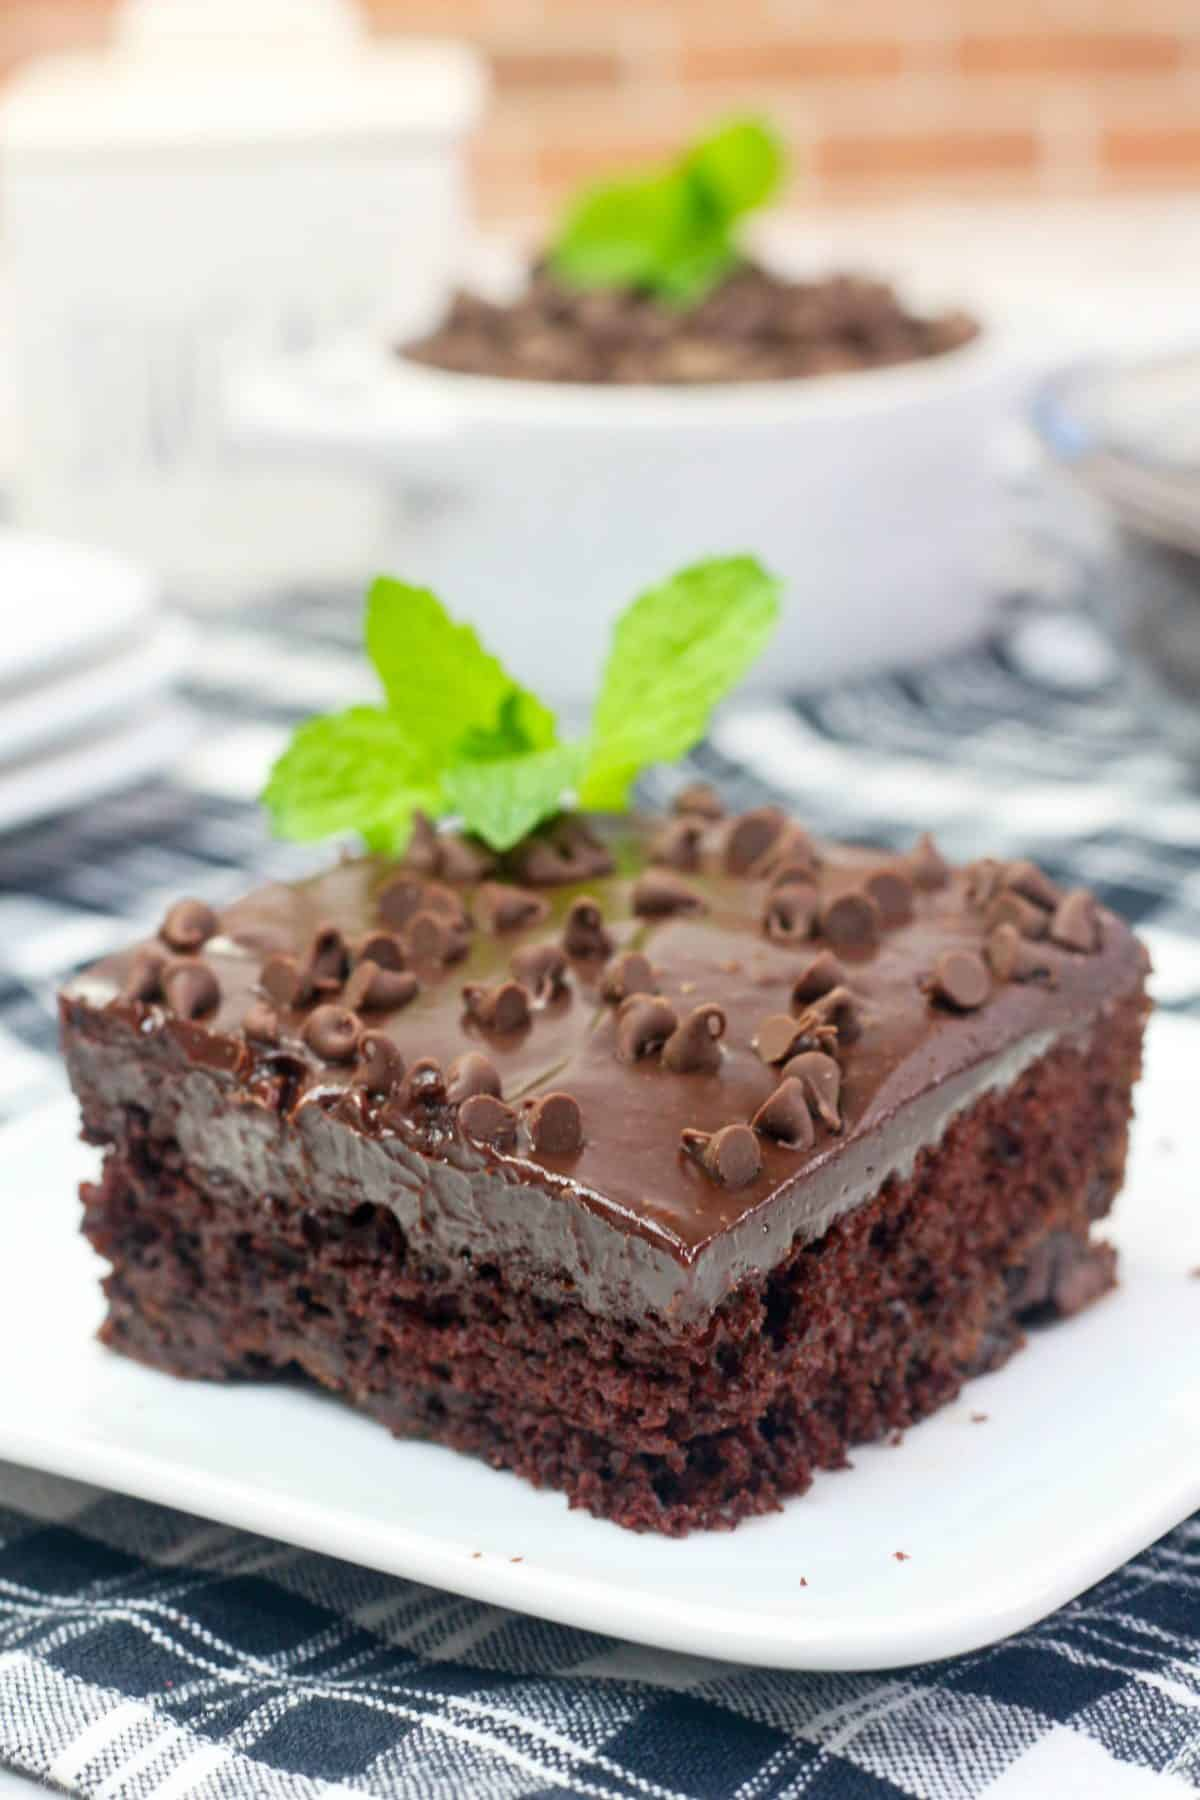 Mint Chocolate Cake, Chocolate Ganache Frosting